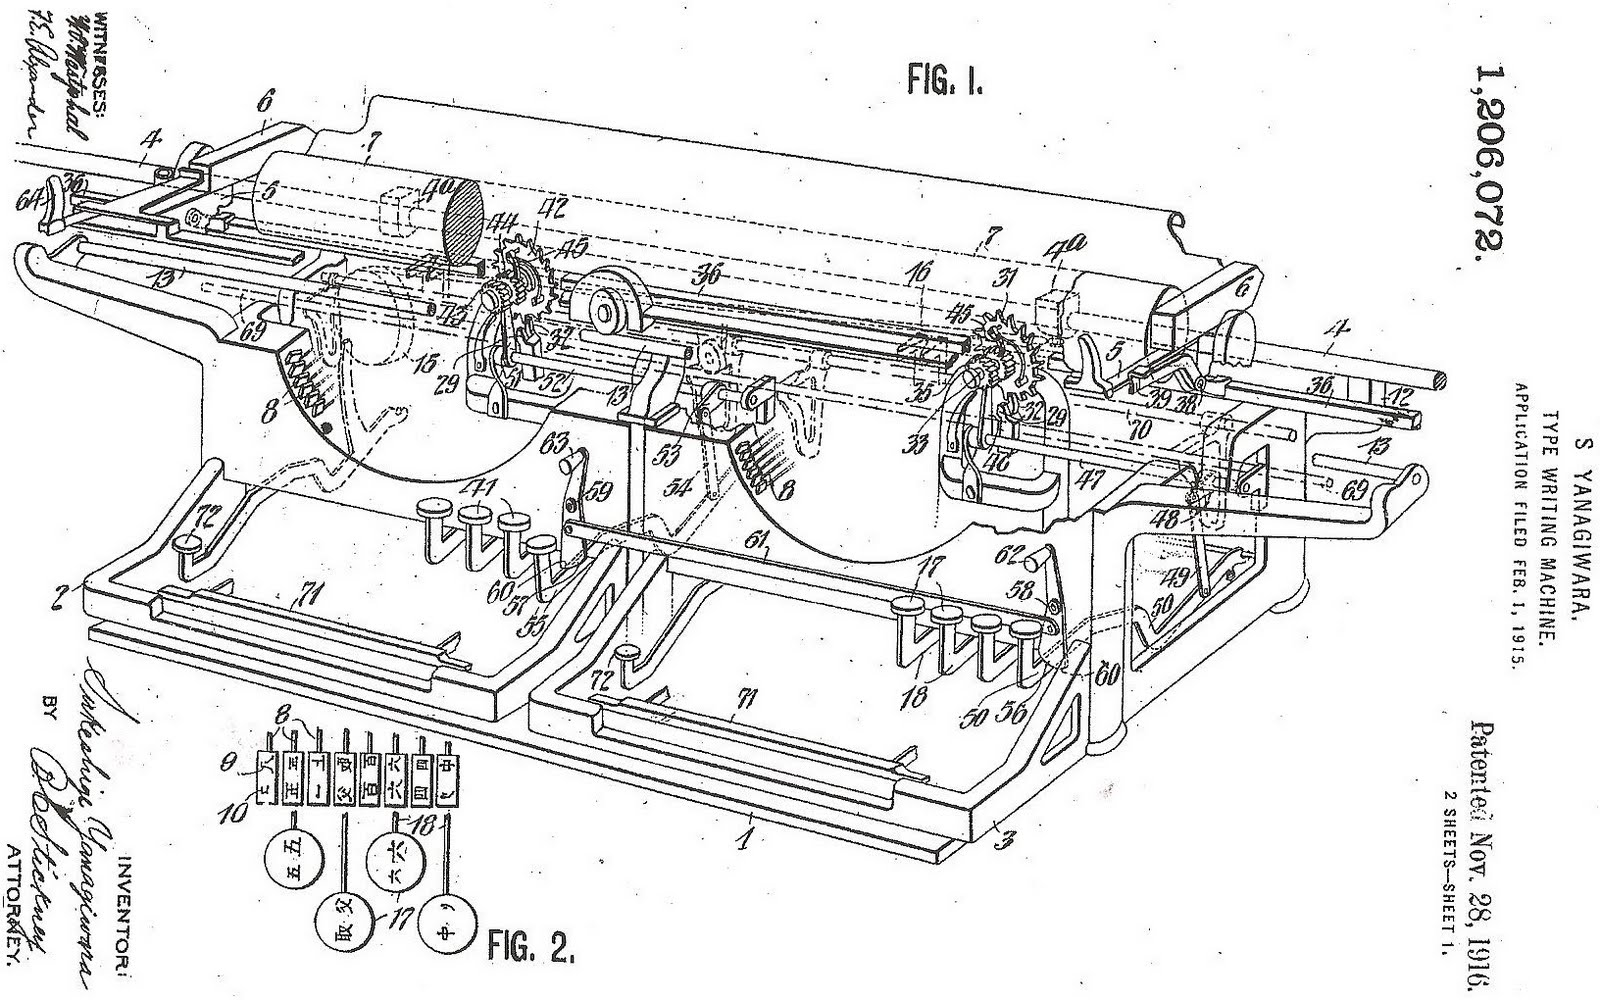 oz.Typewriter: Bull to Brother: 82 Years of Japanese